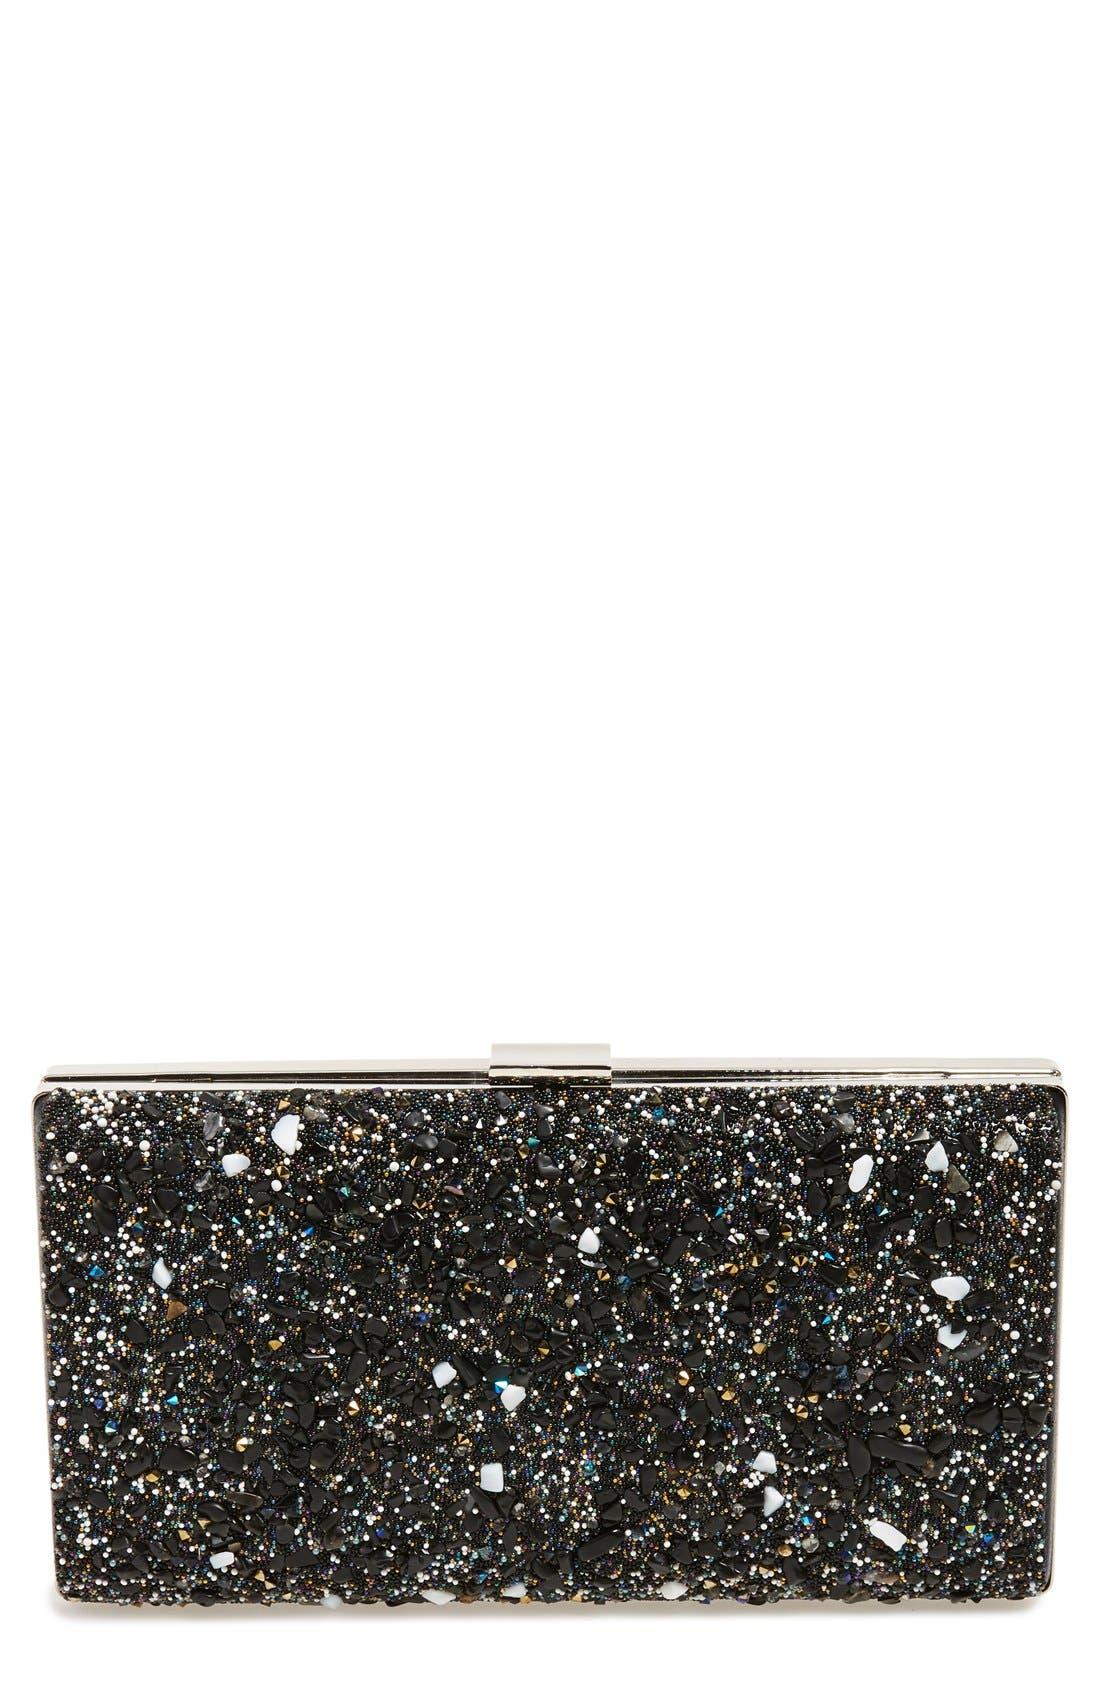 Main Image - Natasha Couture 'Starry Night' Box Clutch